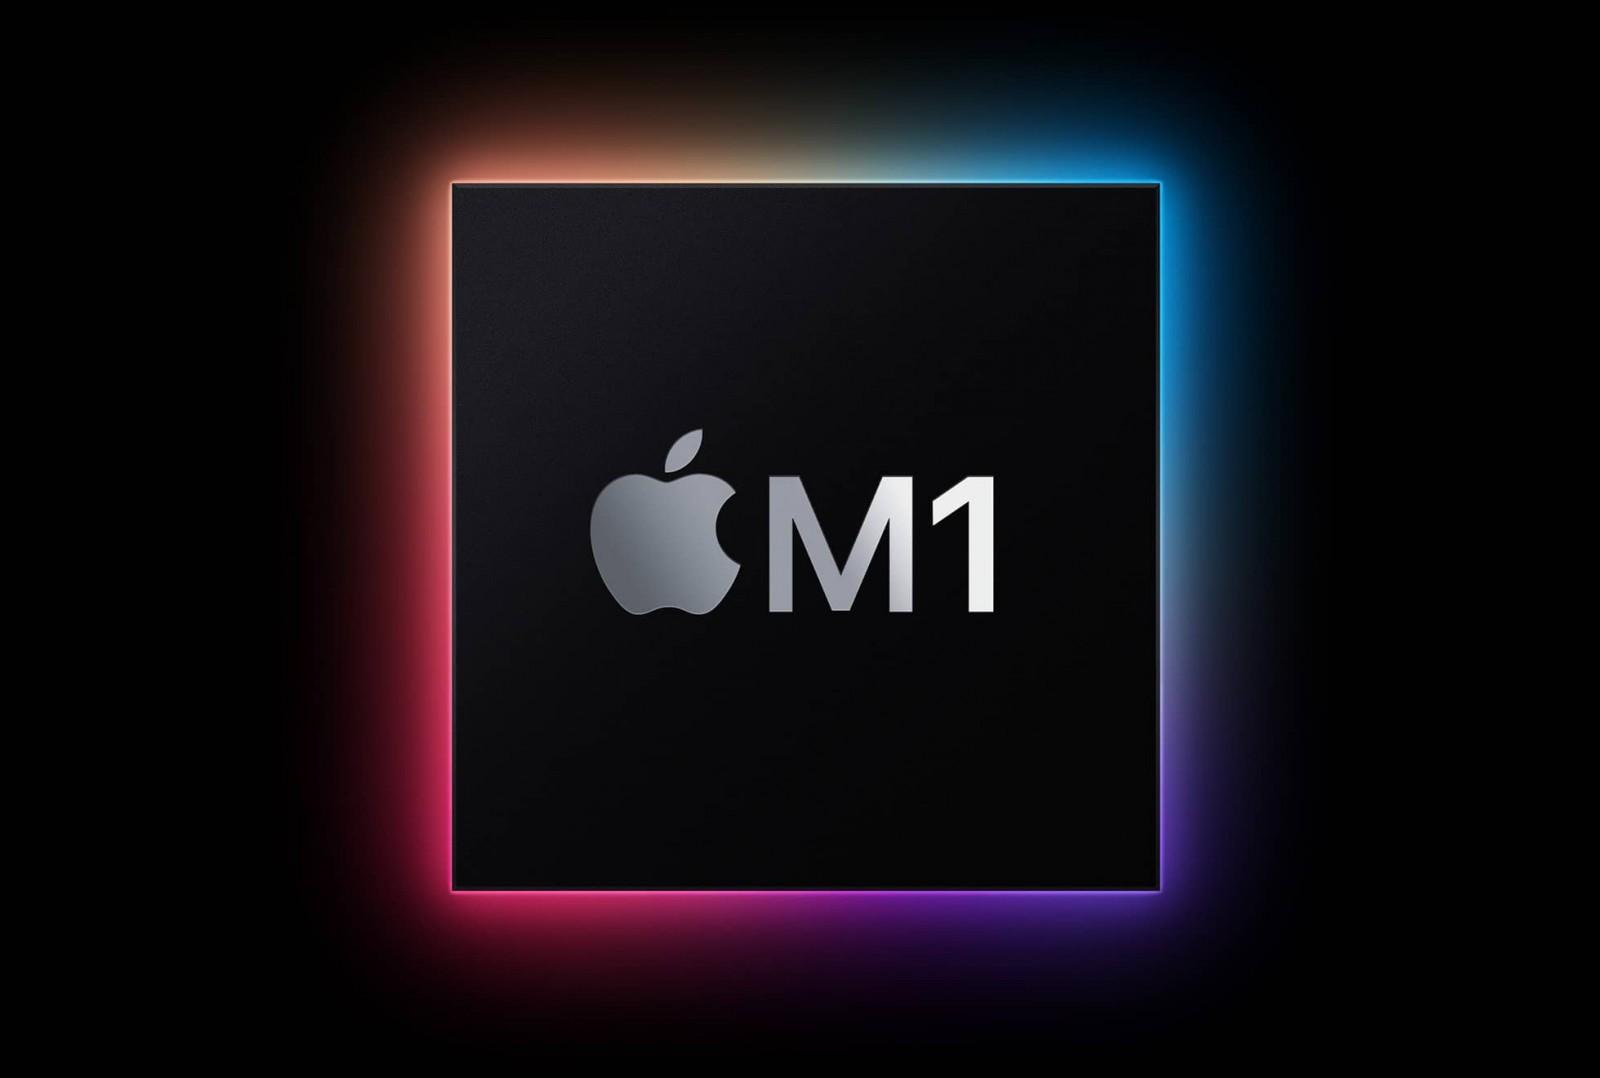 Apple_new-m1-chip-graphic_11102020